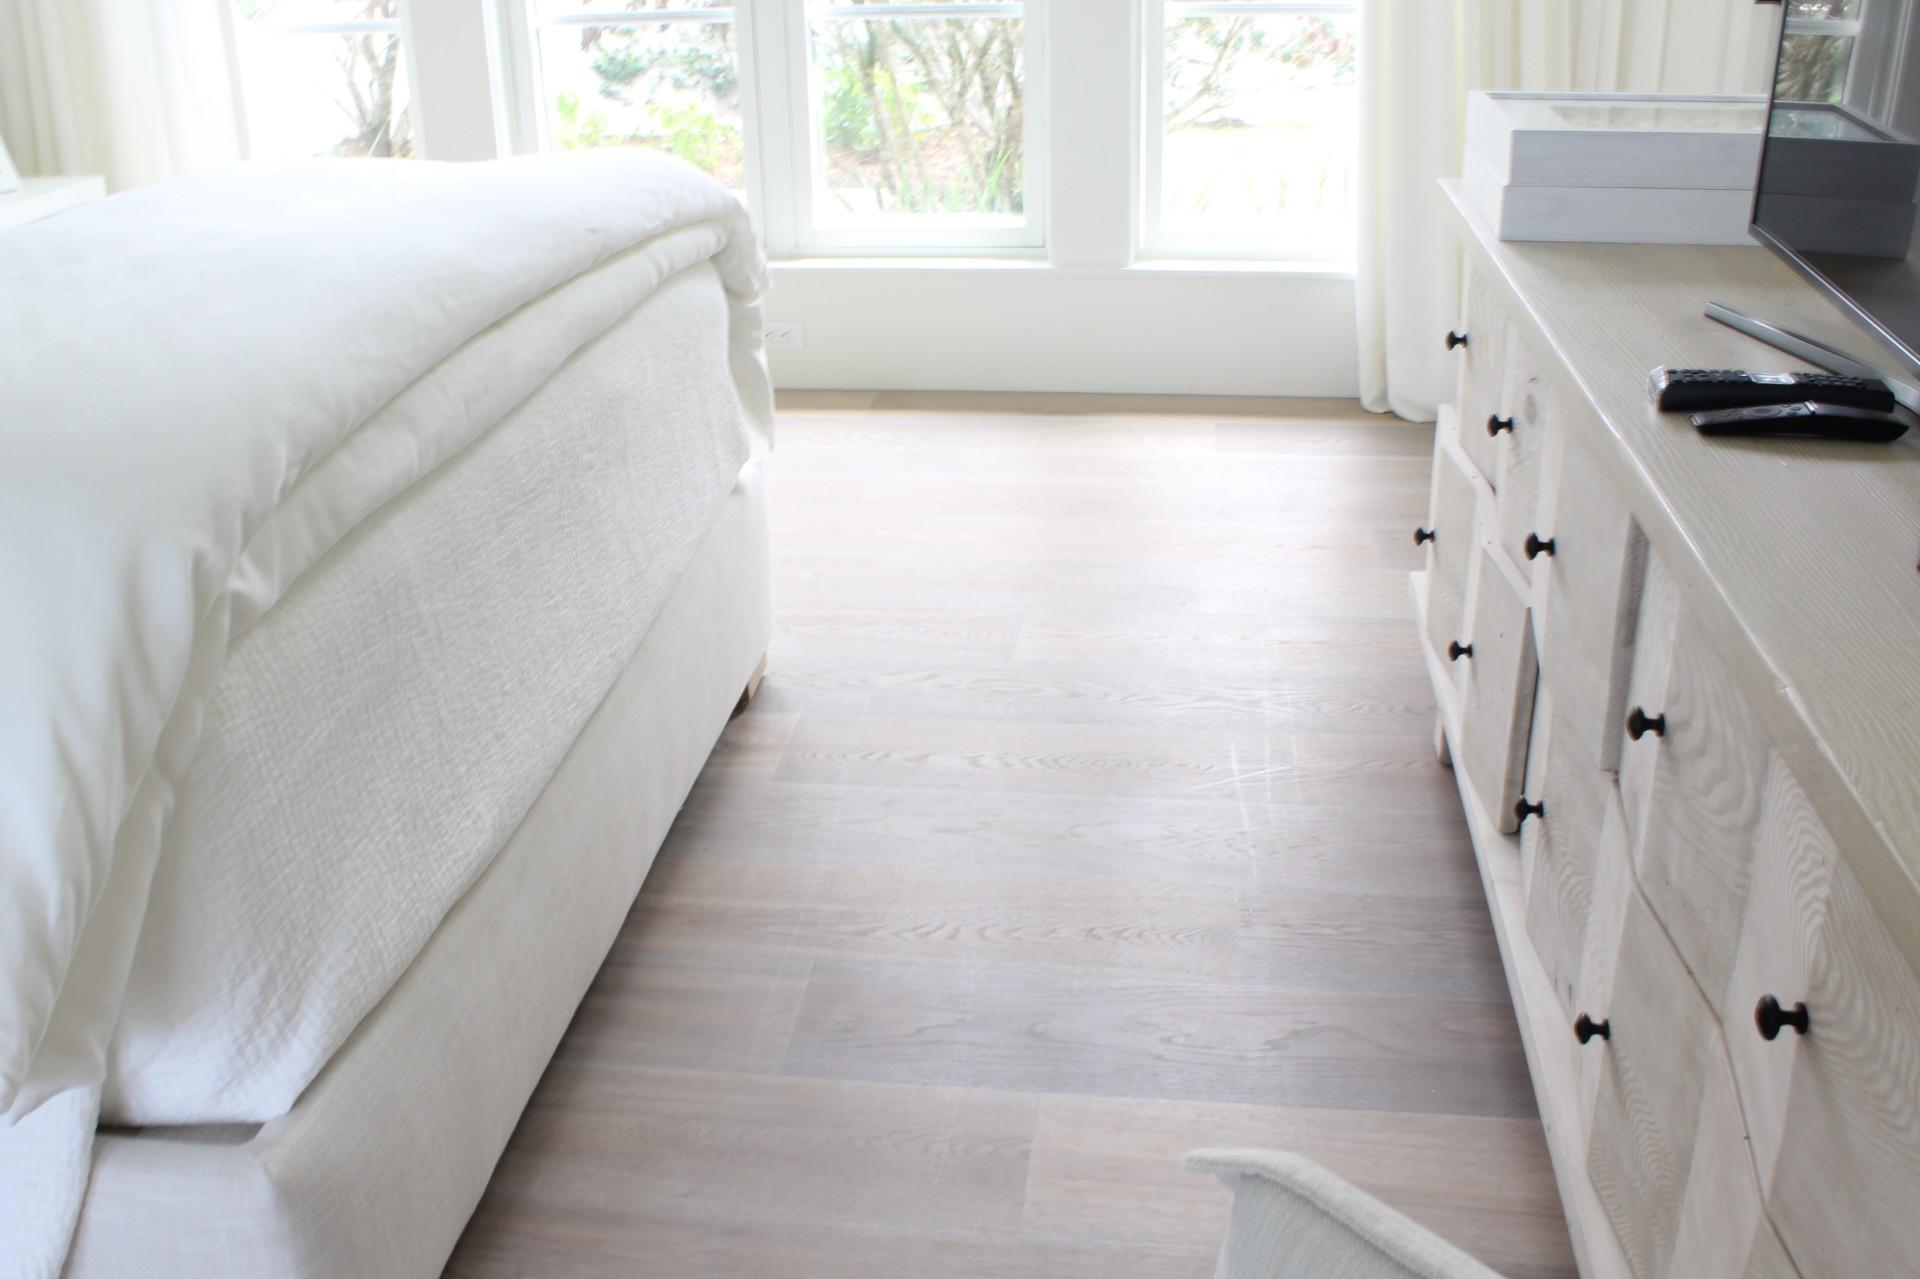 Hardwood, prefinished floor, engineered wood, solid wood, lifestyle, hard surface, prefinished hardwood, prefinished wood, home, bedroom, guest house, design, interior design